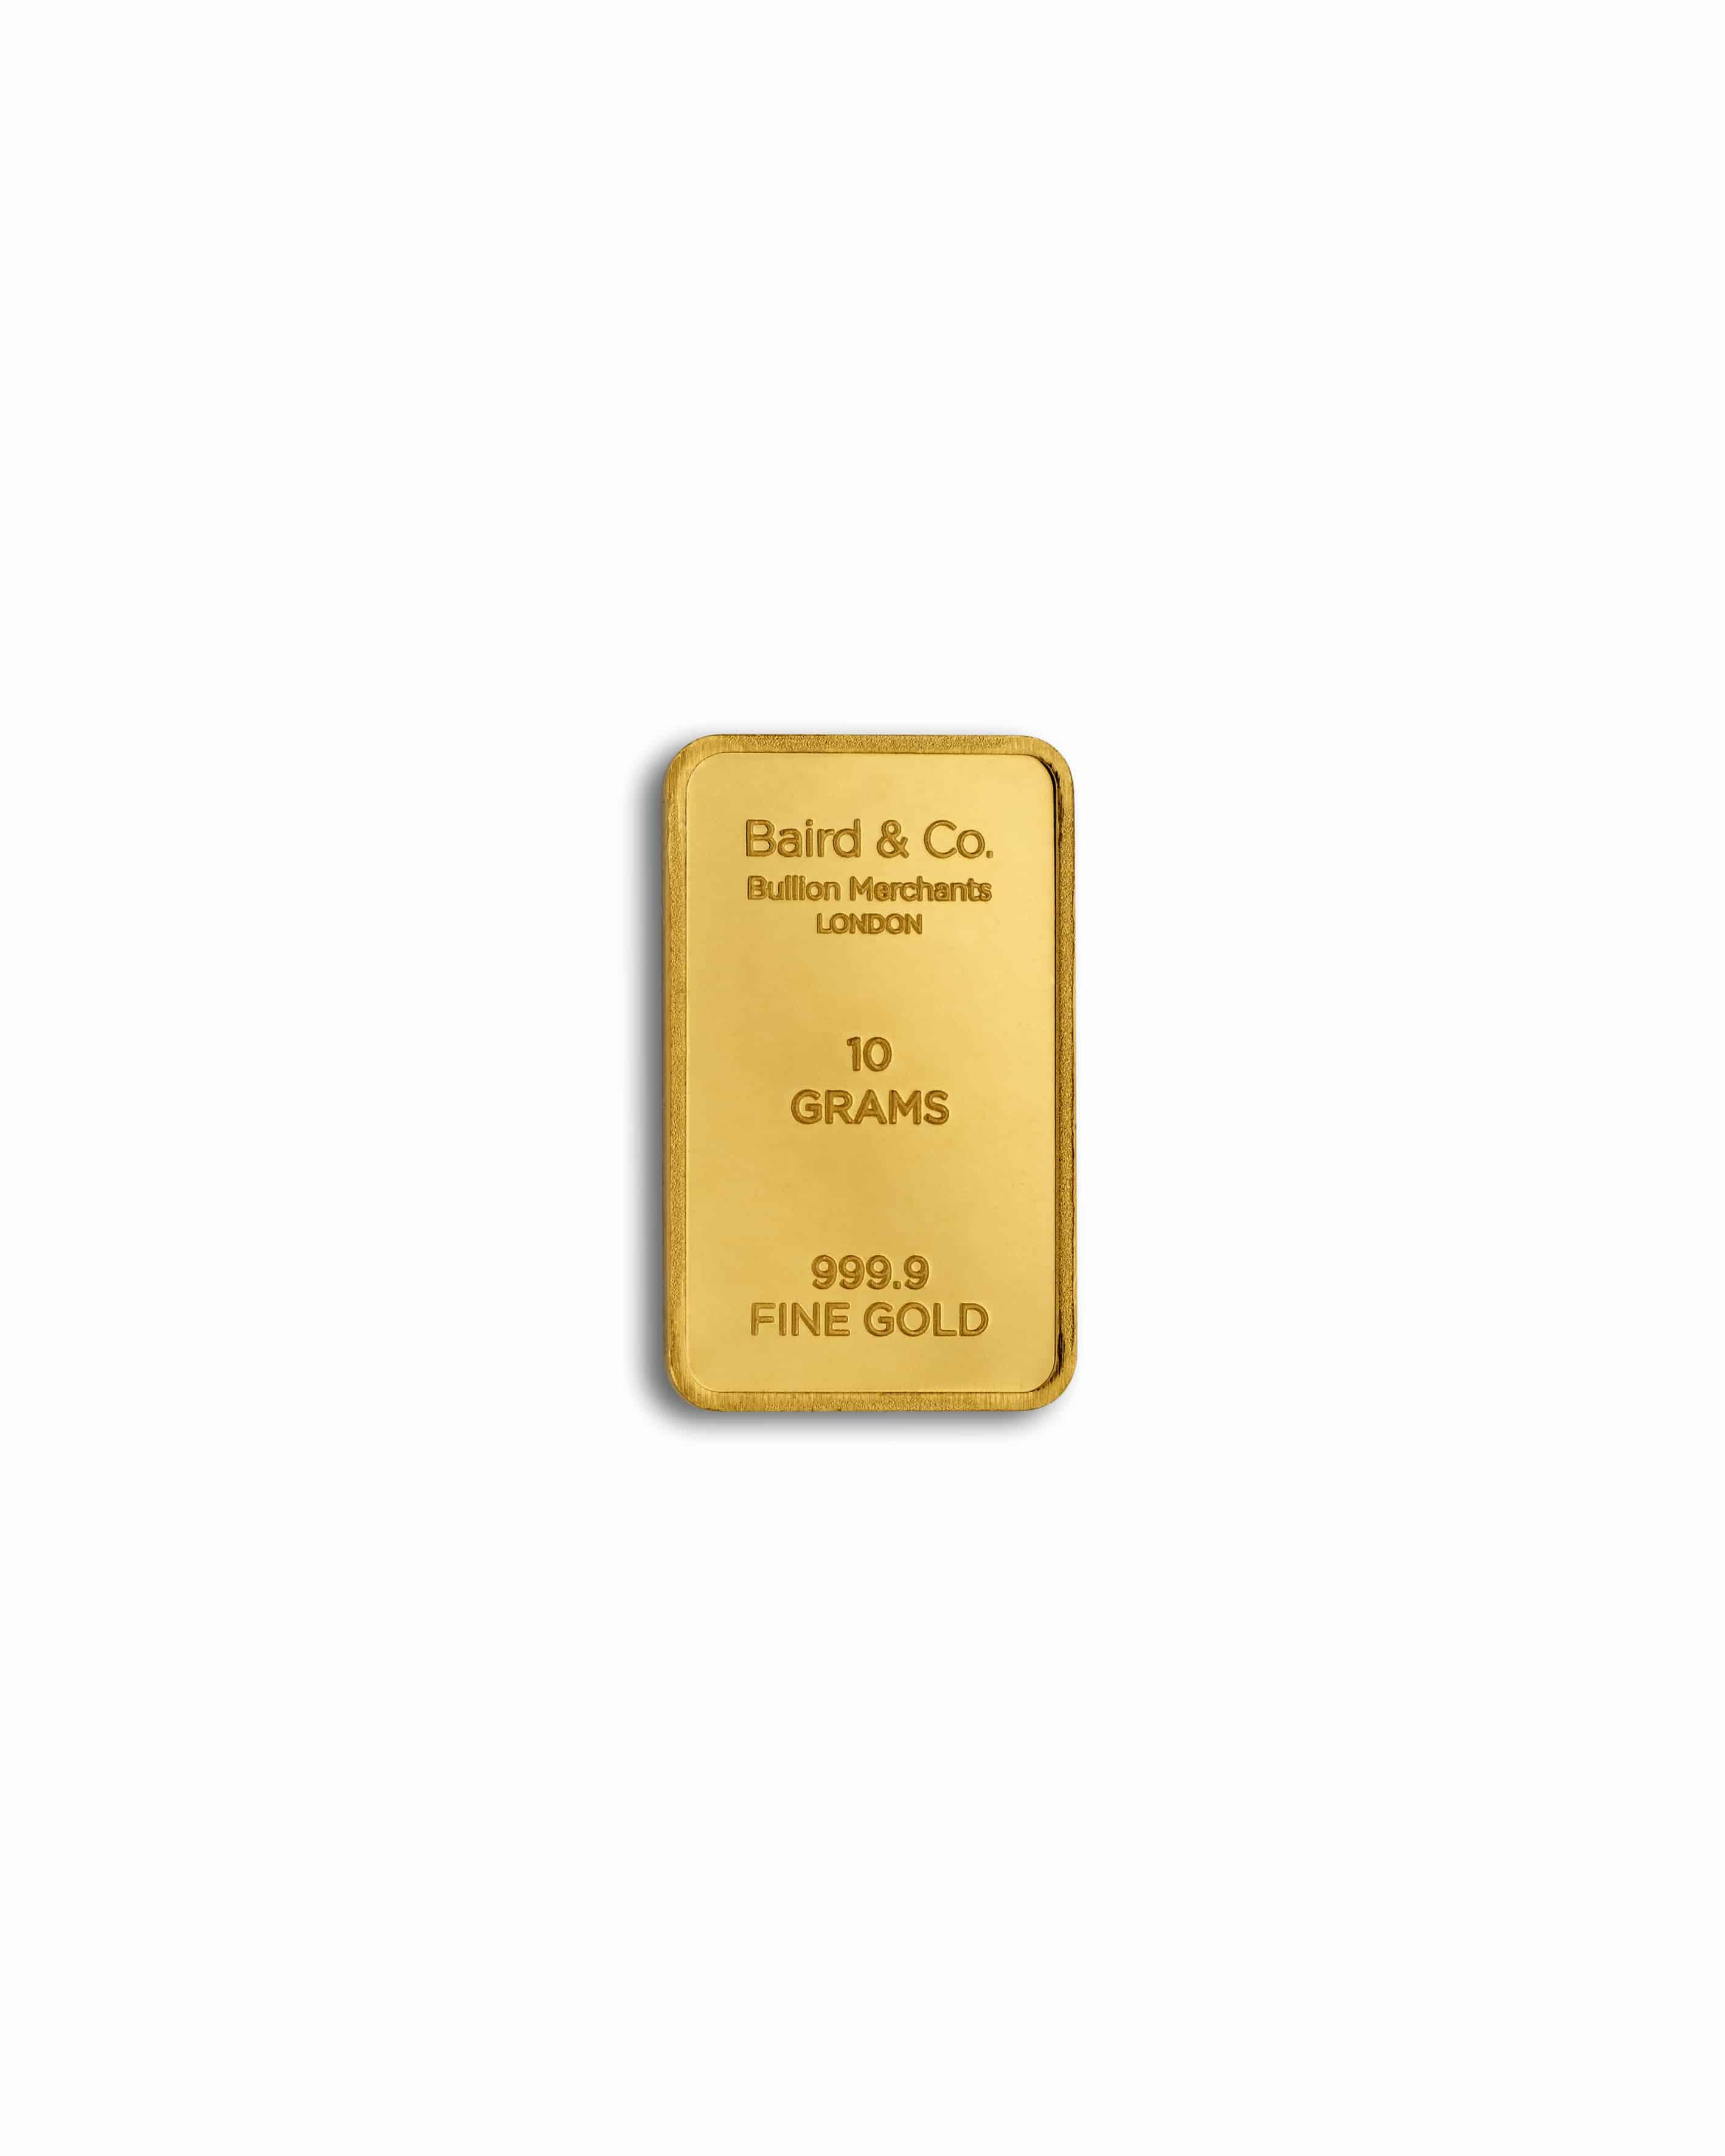 10 gm goldbar - 10.0 Gram Fine Gold Bar in 24ct